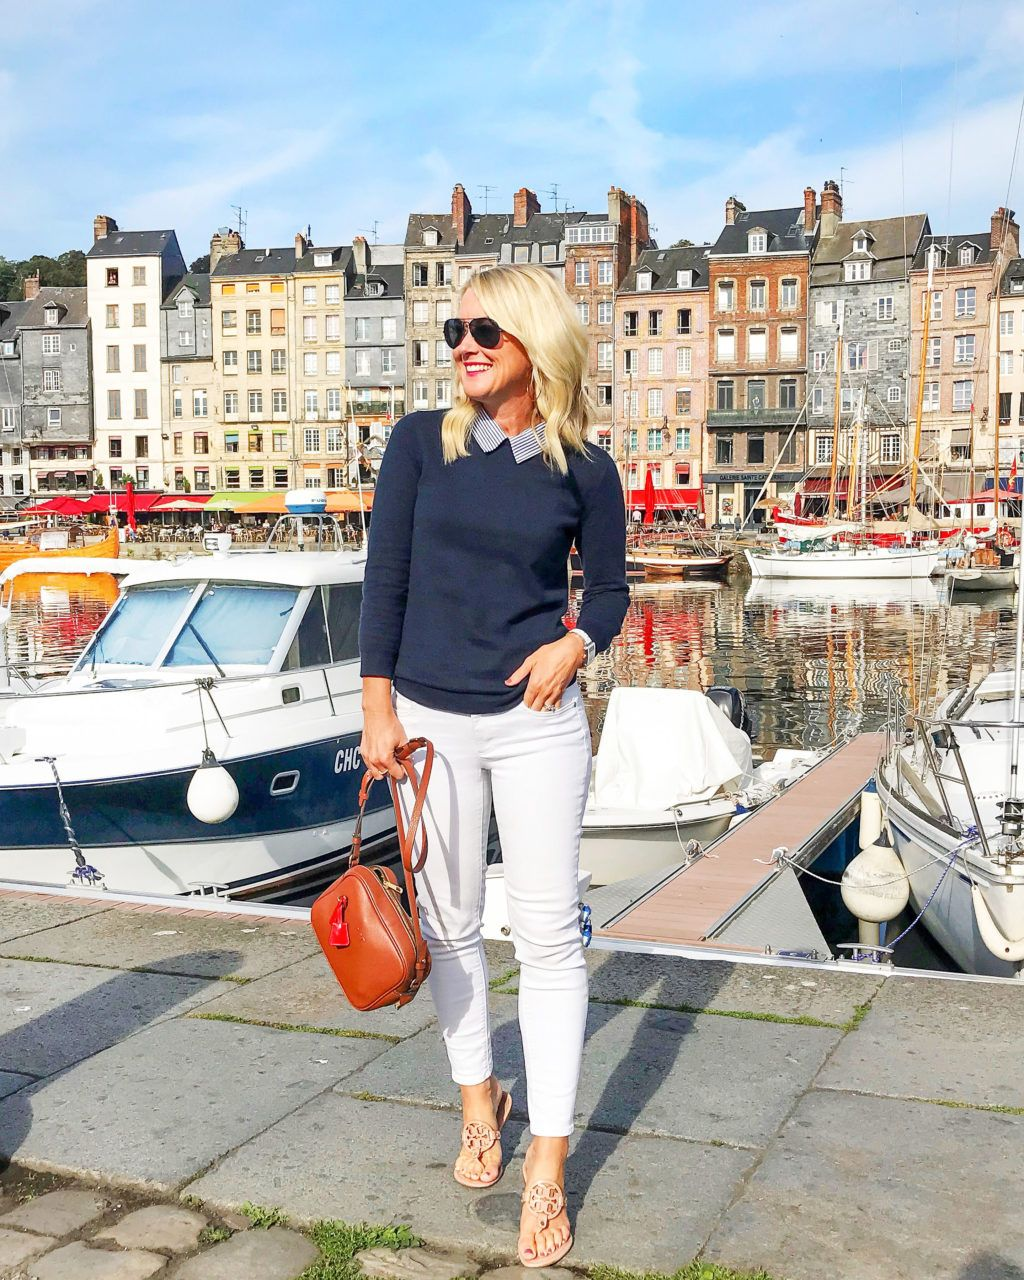 Charming Coastal Towns of the British Isles Cruise #britishisles